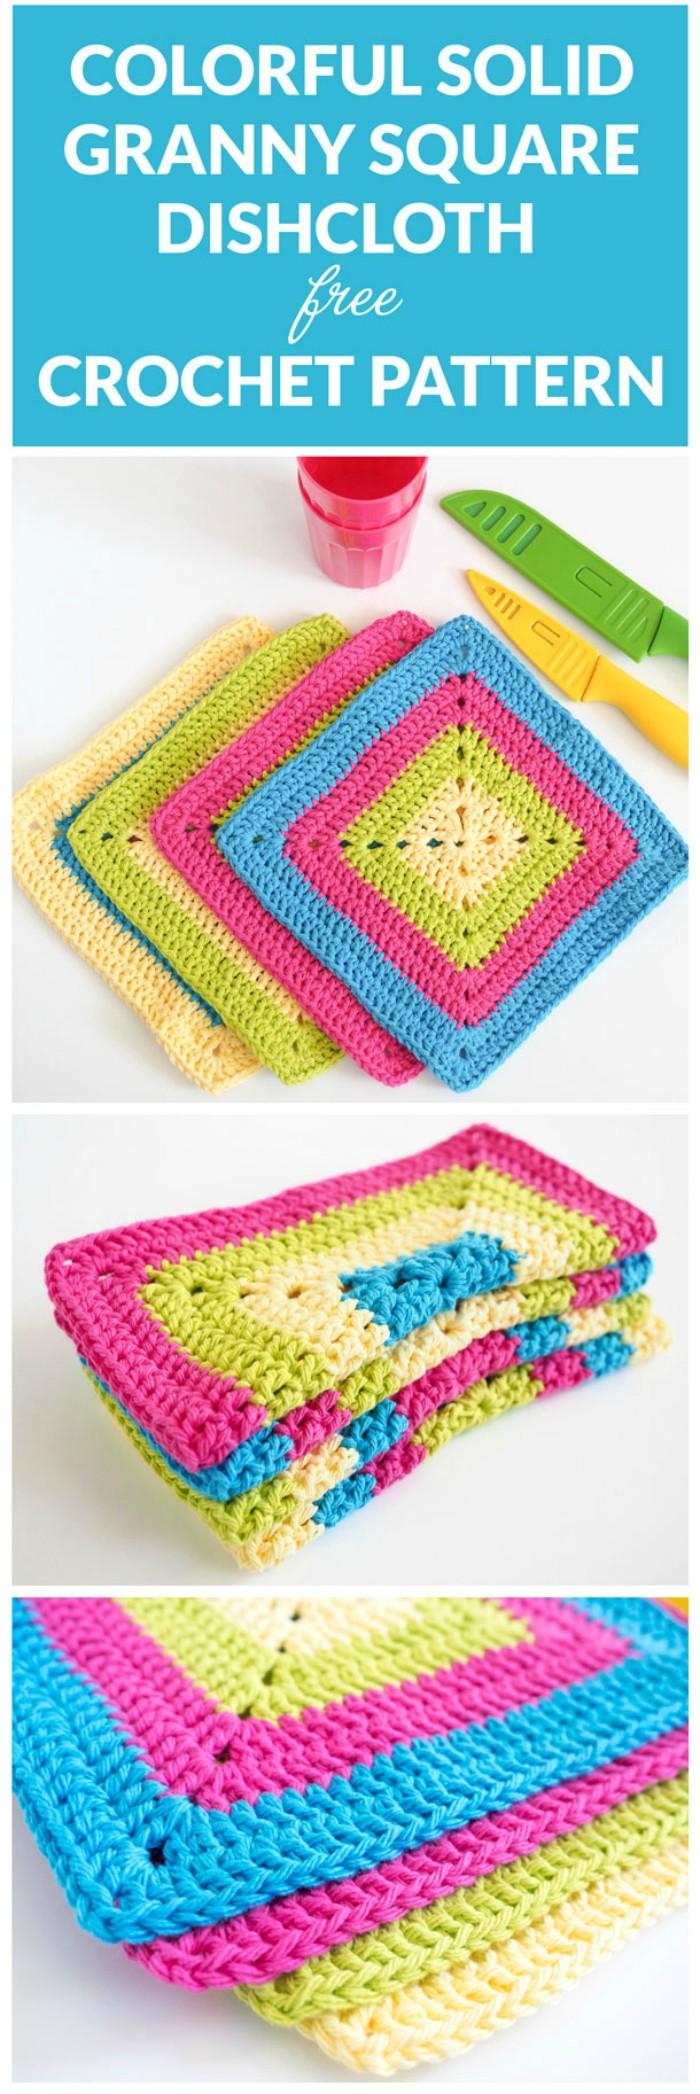 Granny Square Dishcloths